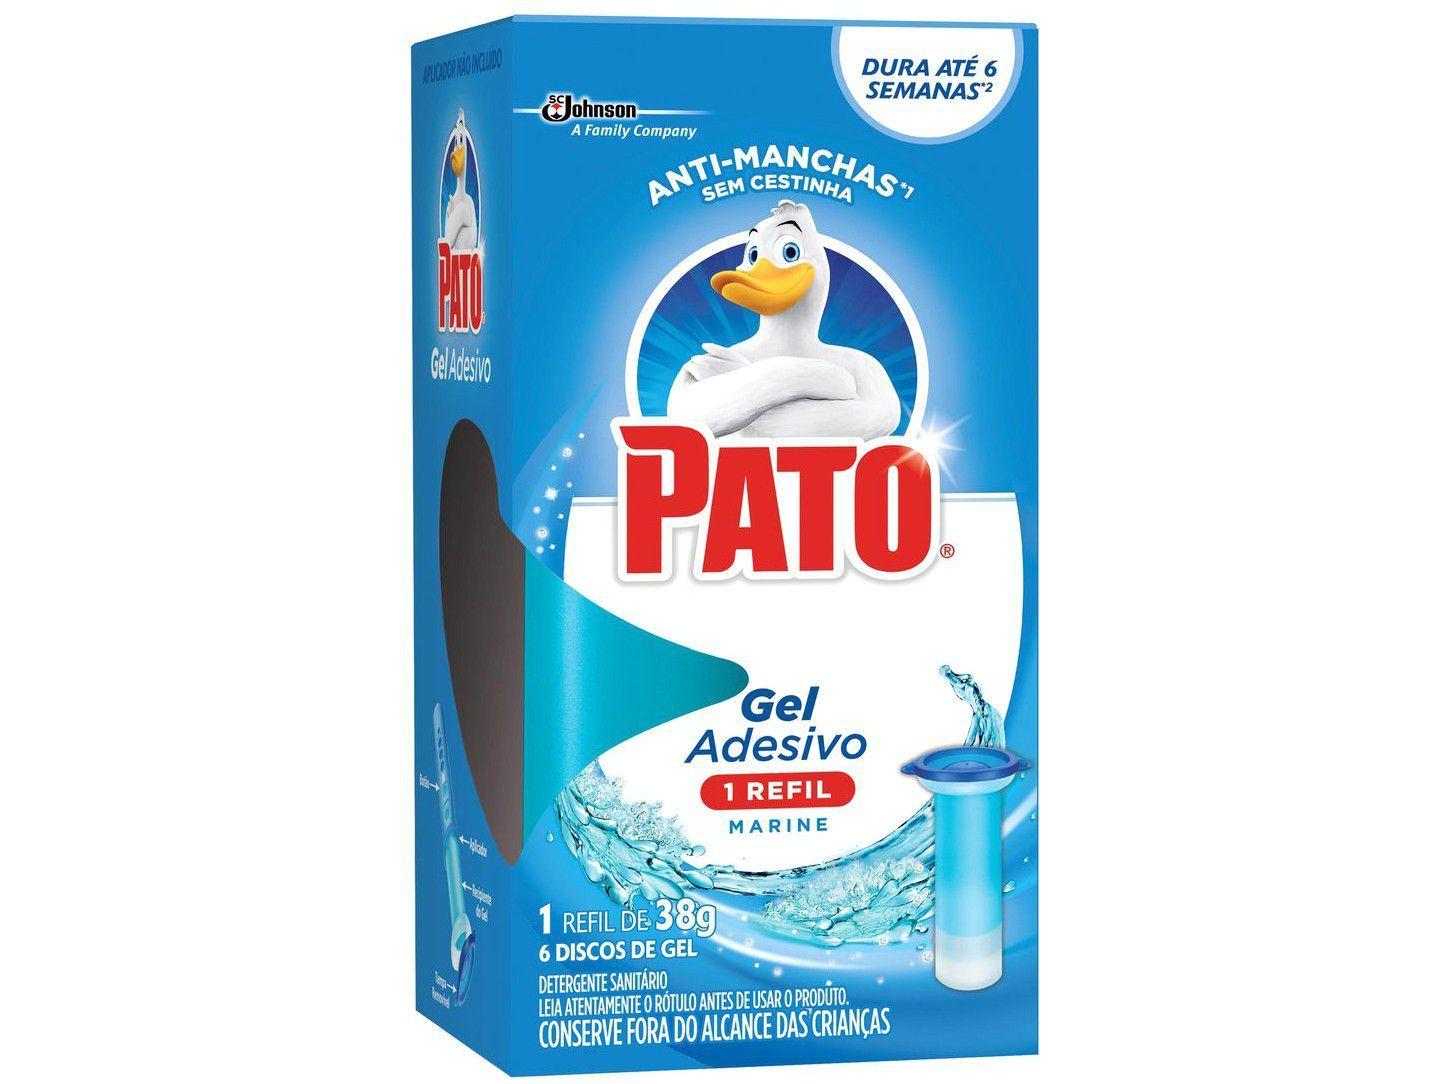 Desodorizador Sanitário Gel Adesivo Pato - Marine Refil 38g